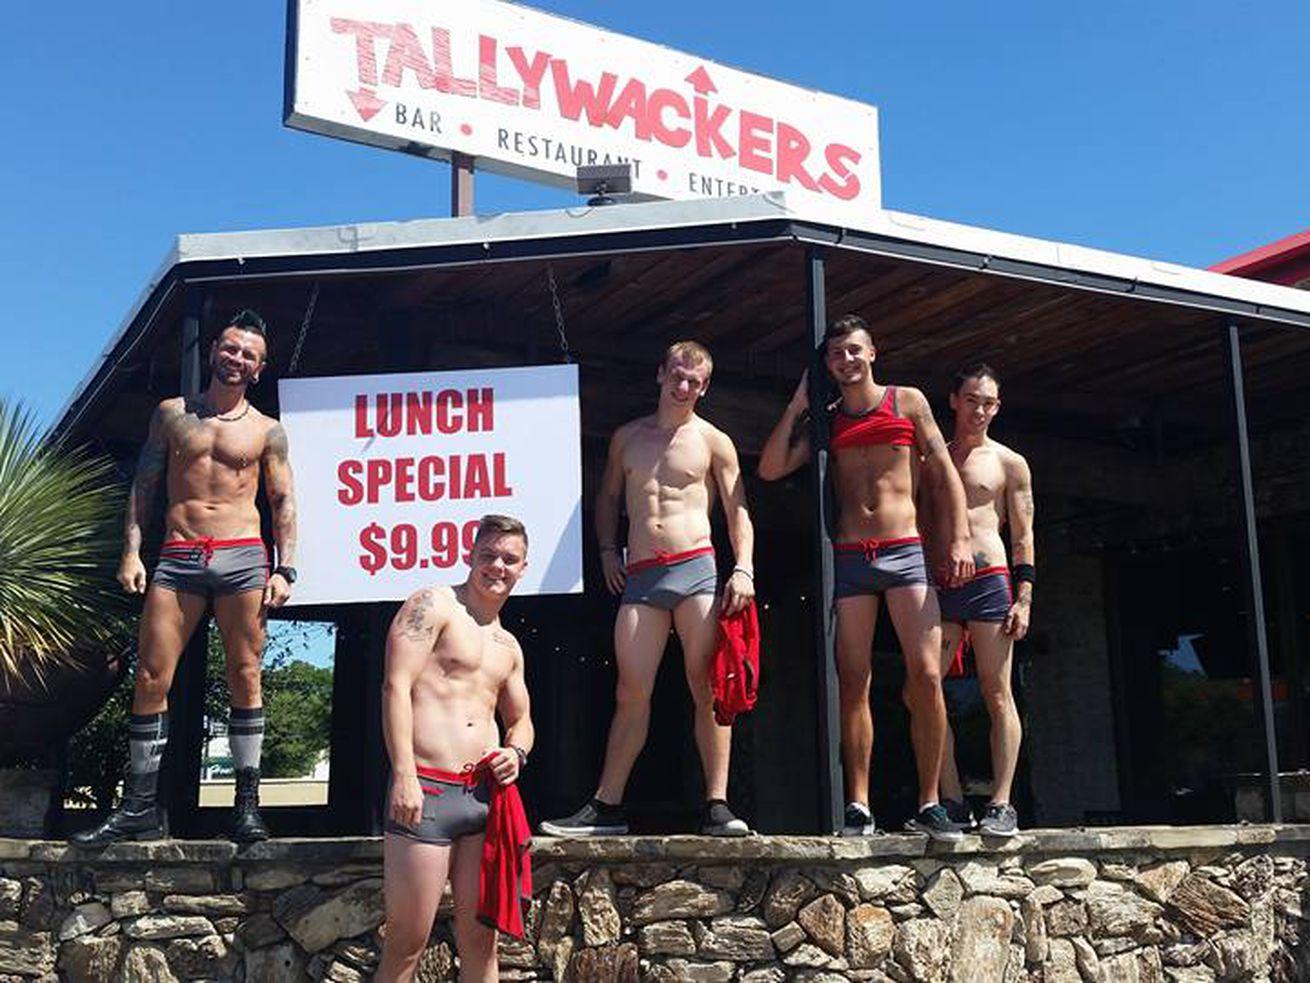 Remembering Tallywackers: America